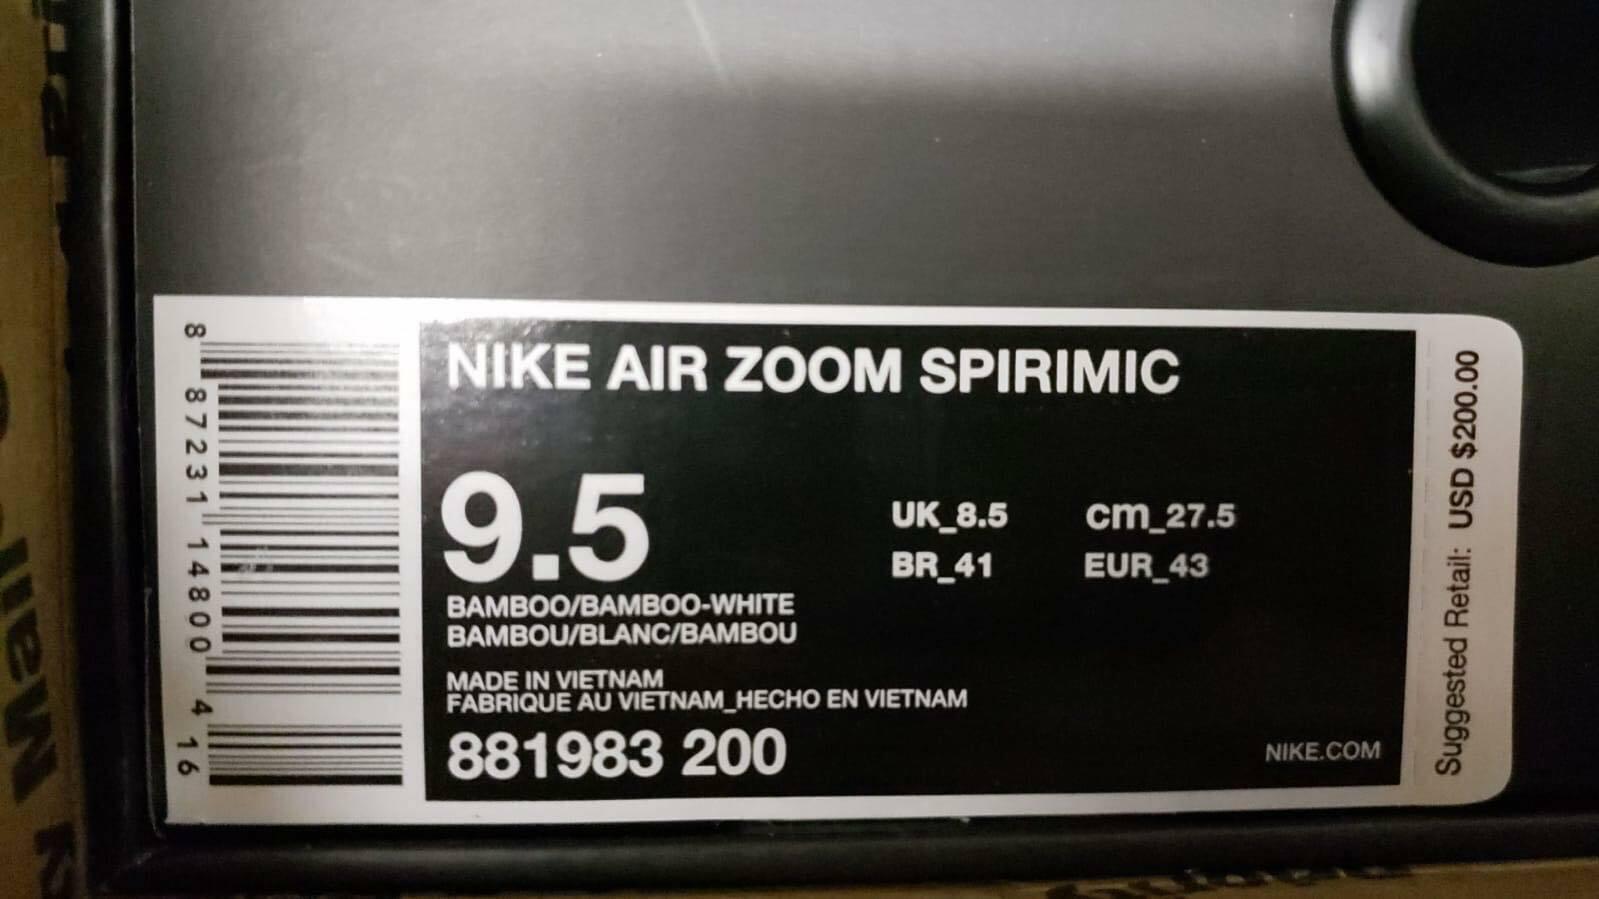 Mens Nike Air Zoom Spirimic Spirimic Spirimic 881983-200 Bamboo Bamboo Brand New Size 9.5 1dbd88